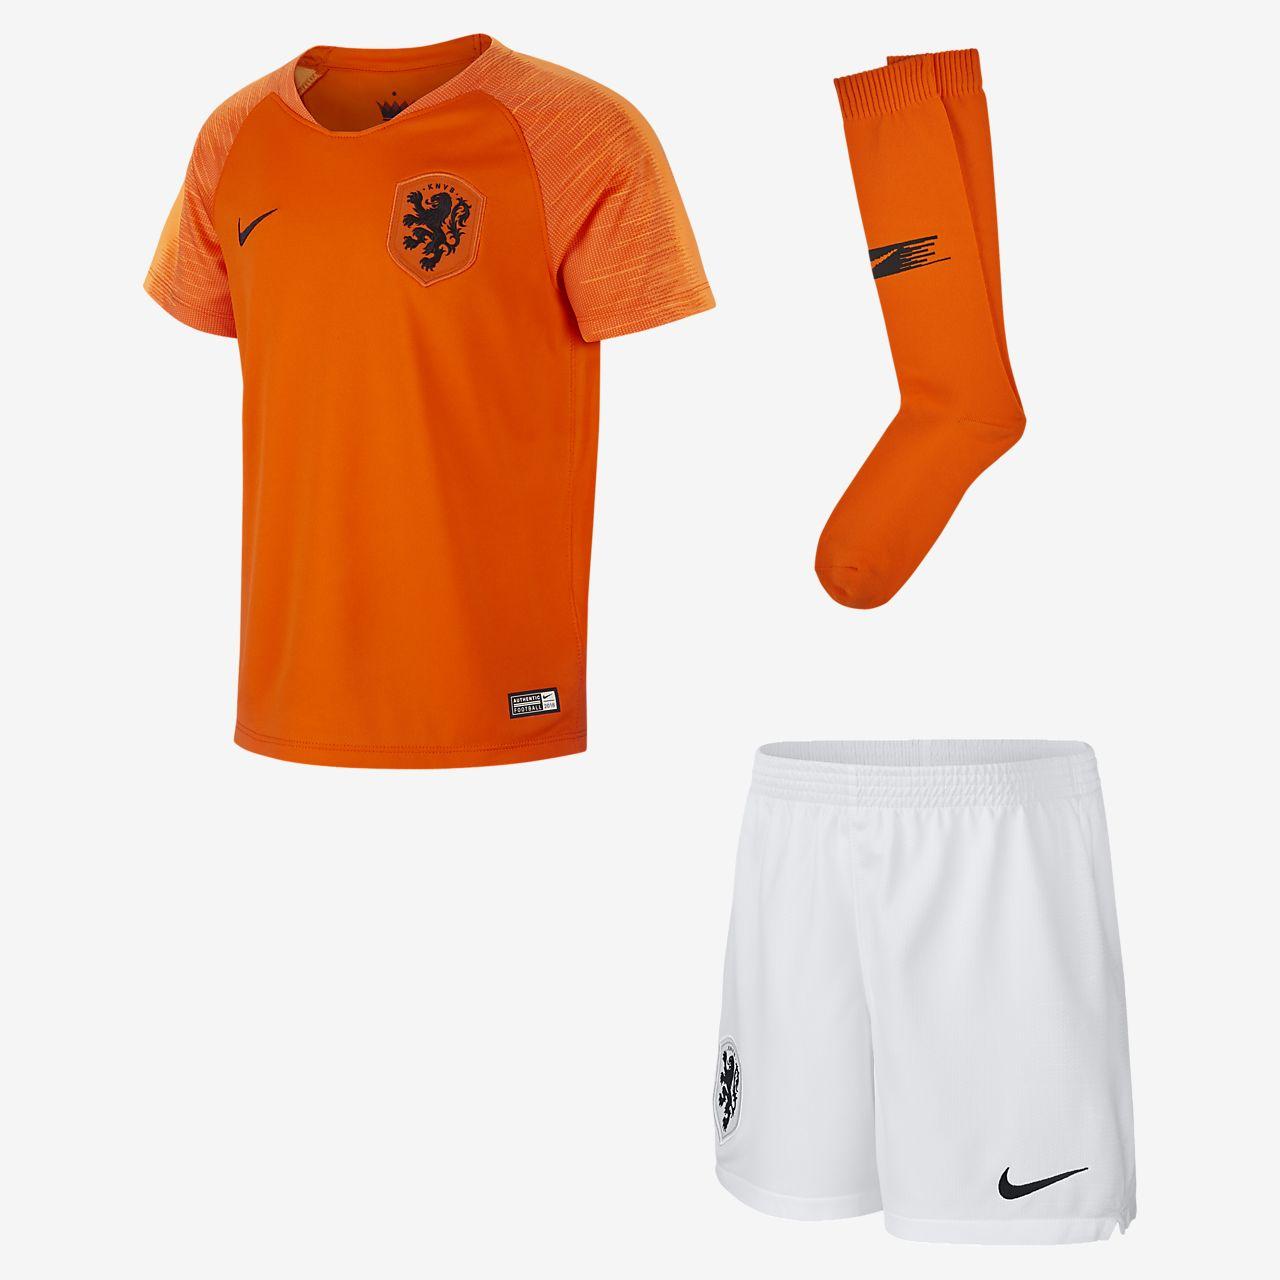 2018/19 Netherlands Stadium Home Fußballtrikot für jüngere Kinder